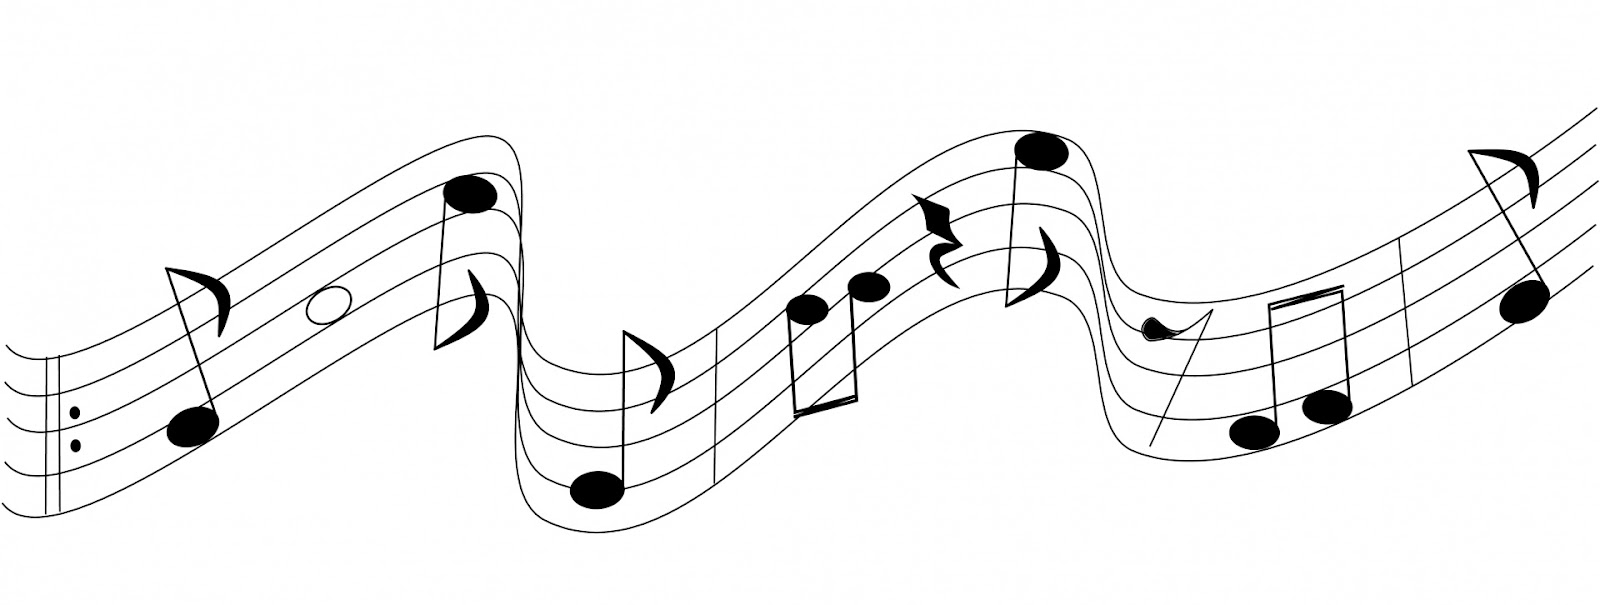 Music Images - Public Domain Pictures - Page 1